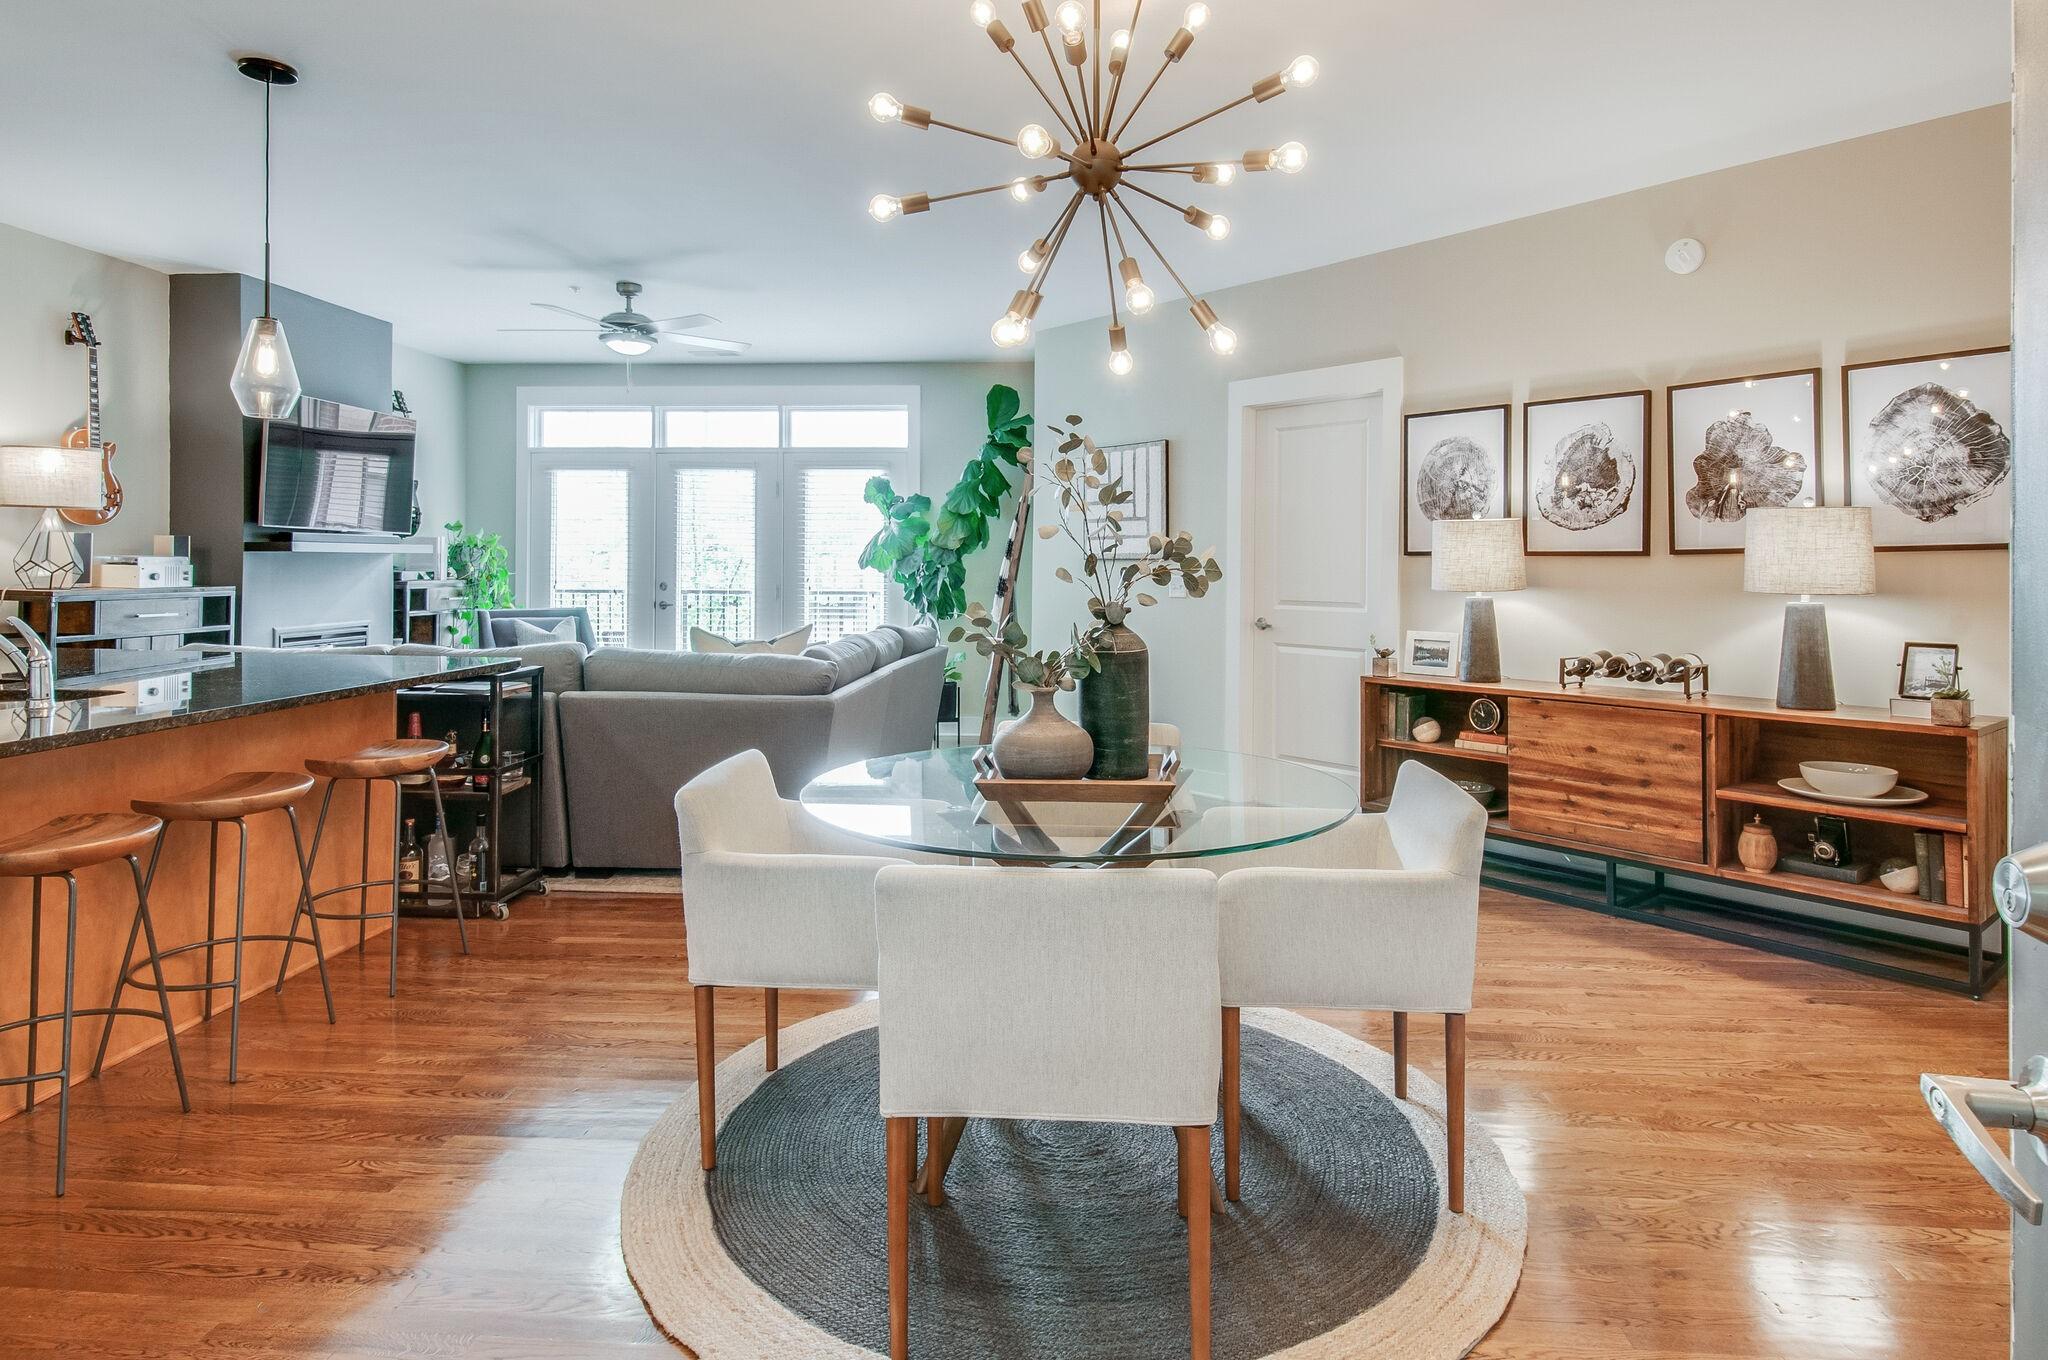 817 3rd Ave N #317 Property Photo - Nashville, TN real estate listing